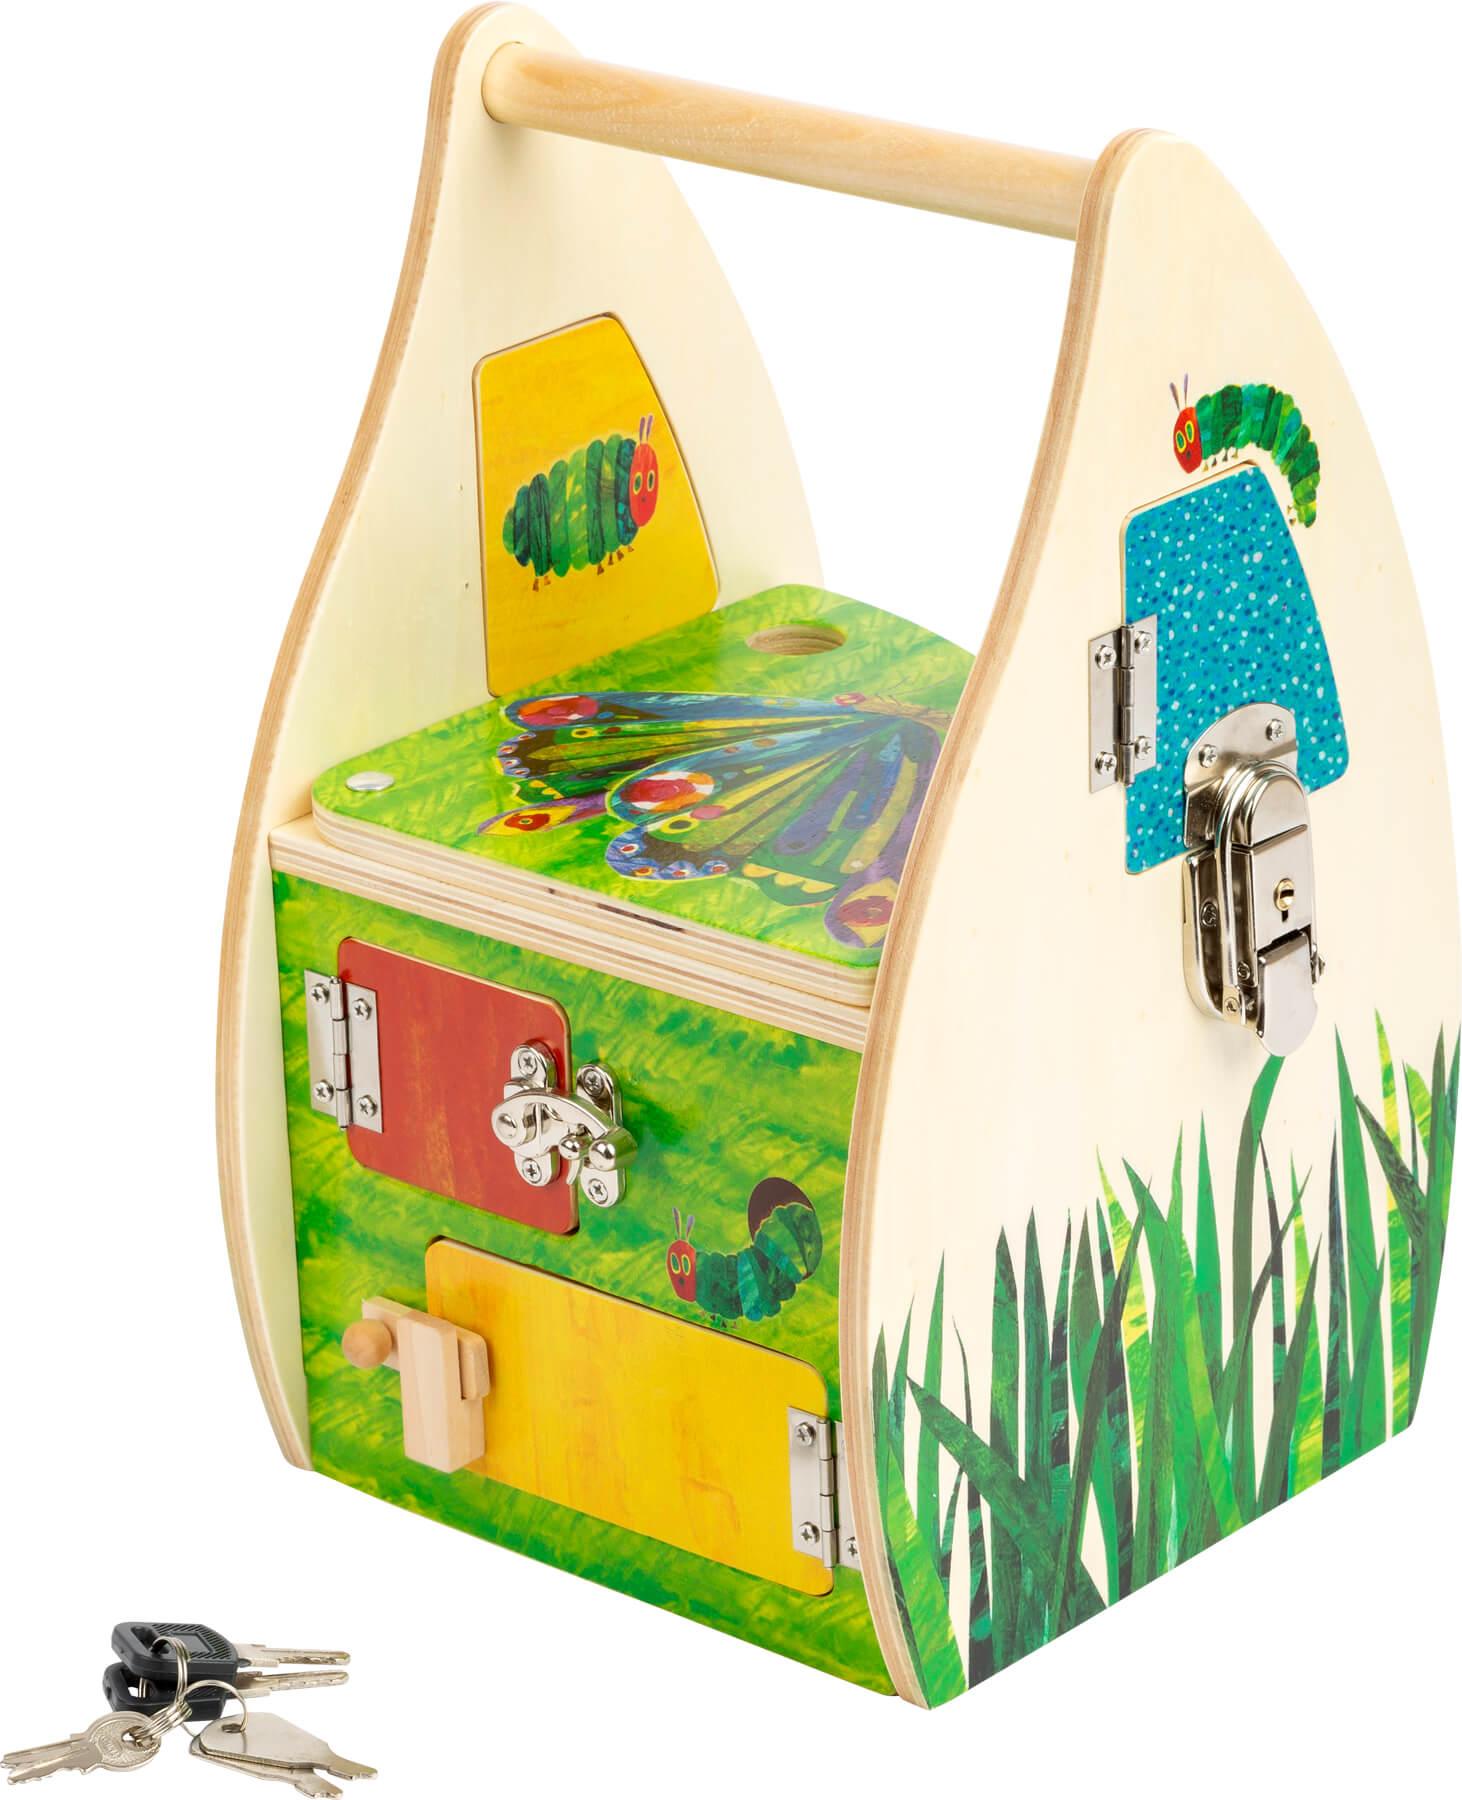 casita de cerraduras 'la pequeña oruga glotona'-Ukitu juguetes